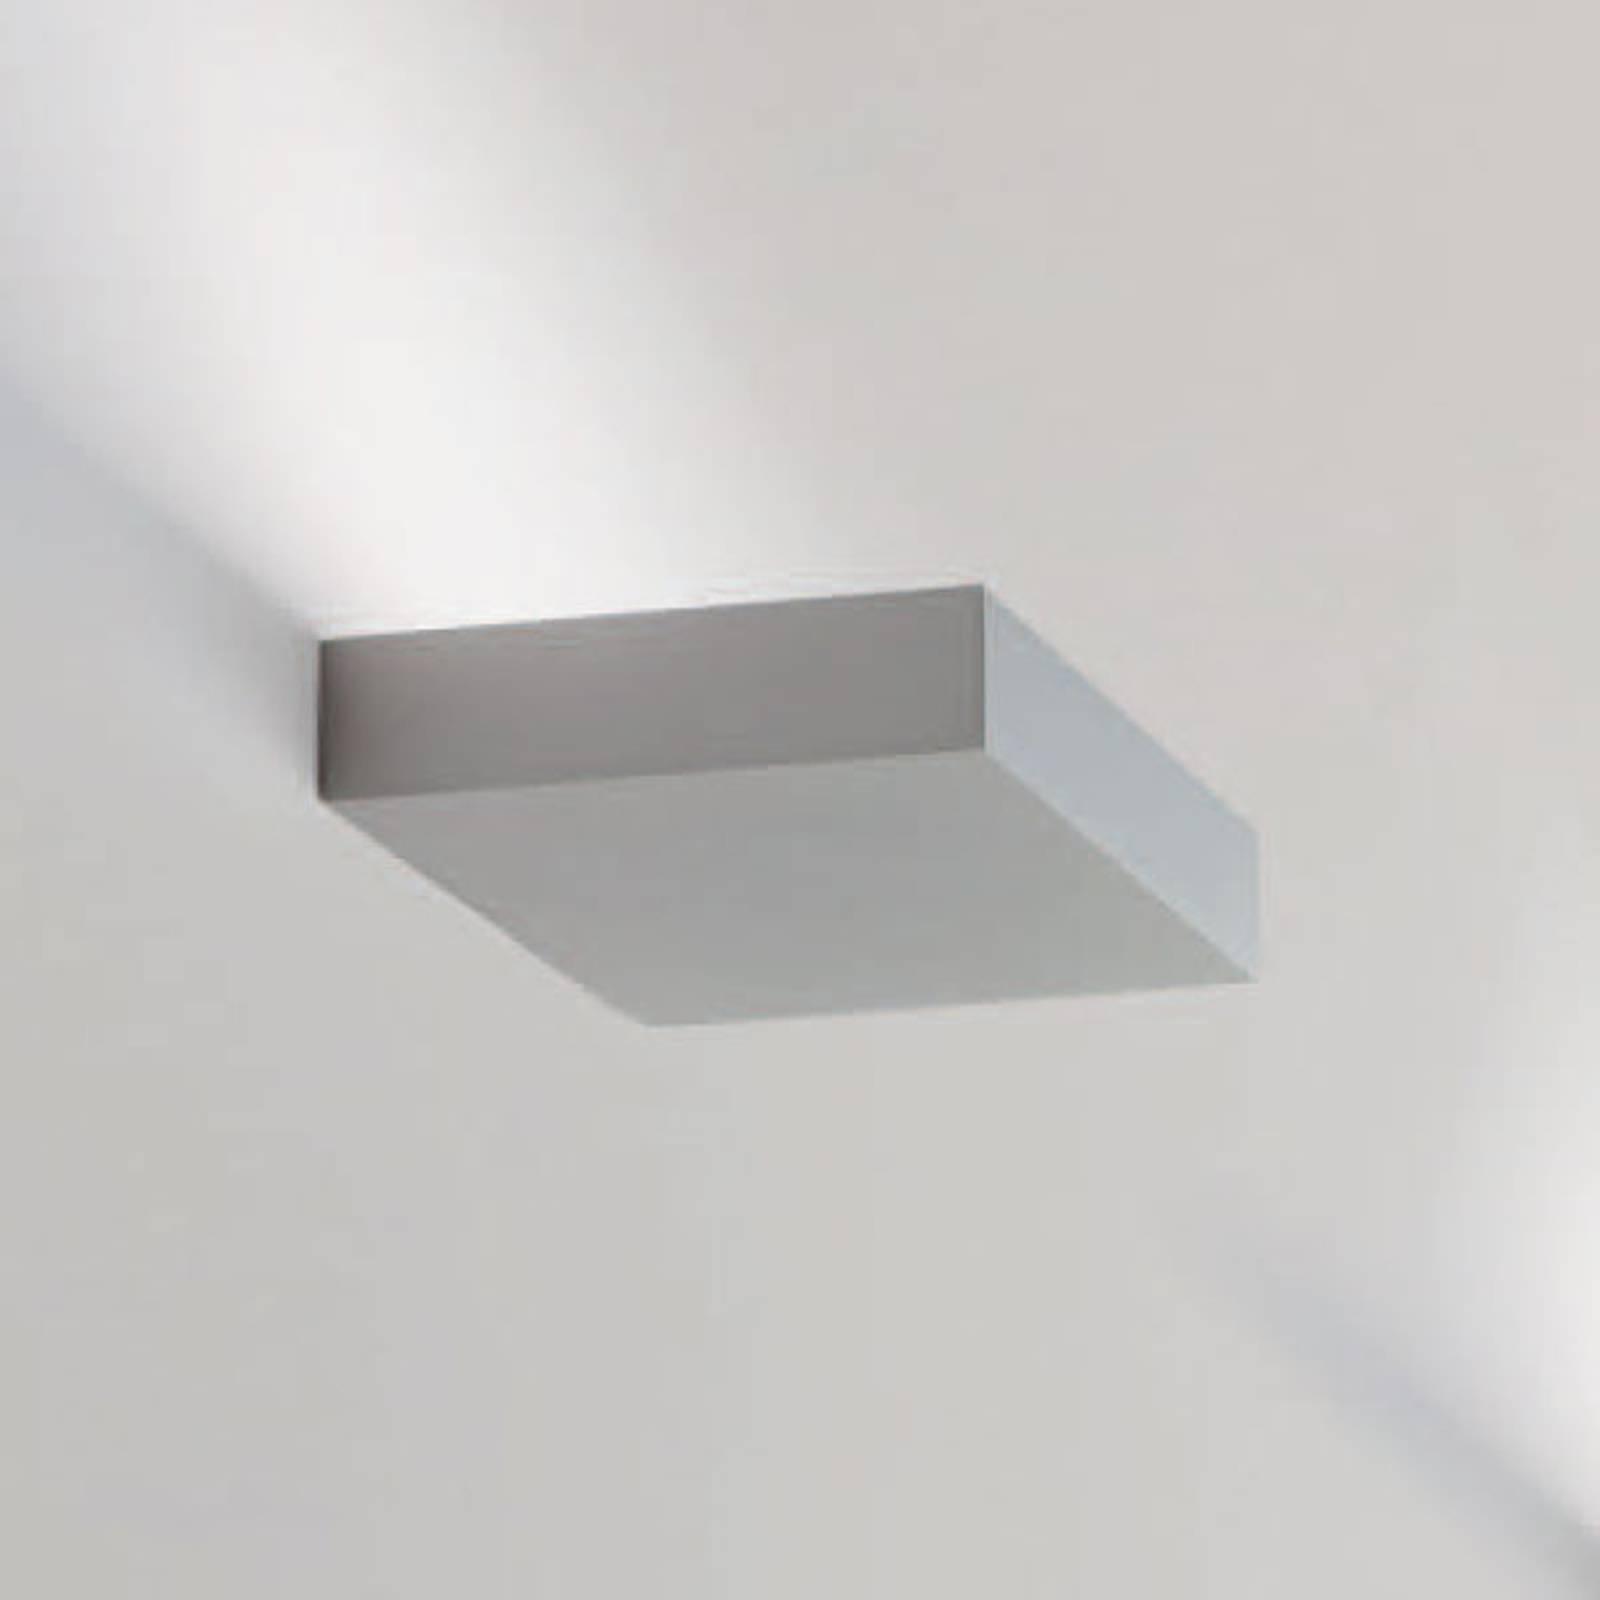 LED-seinävalaisin Regolo, pituus 16,3 cm, alumiini